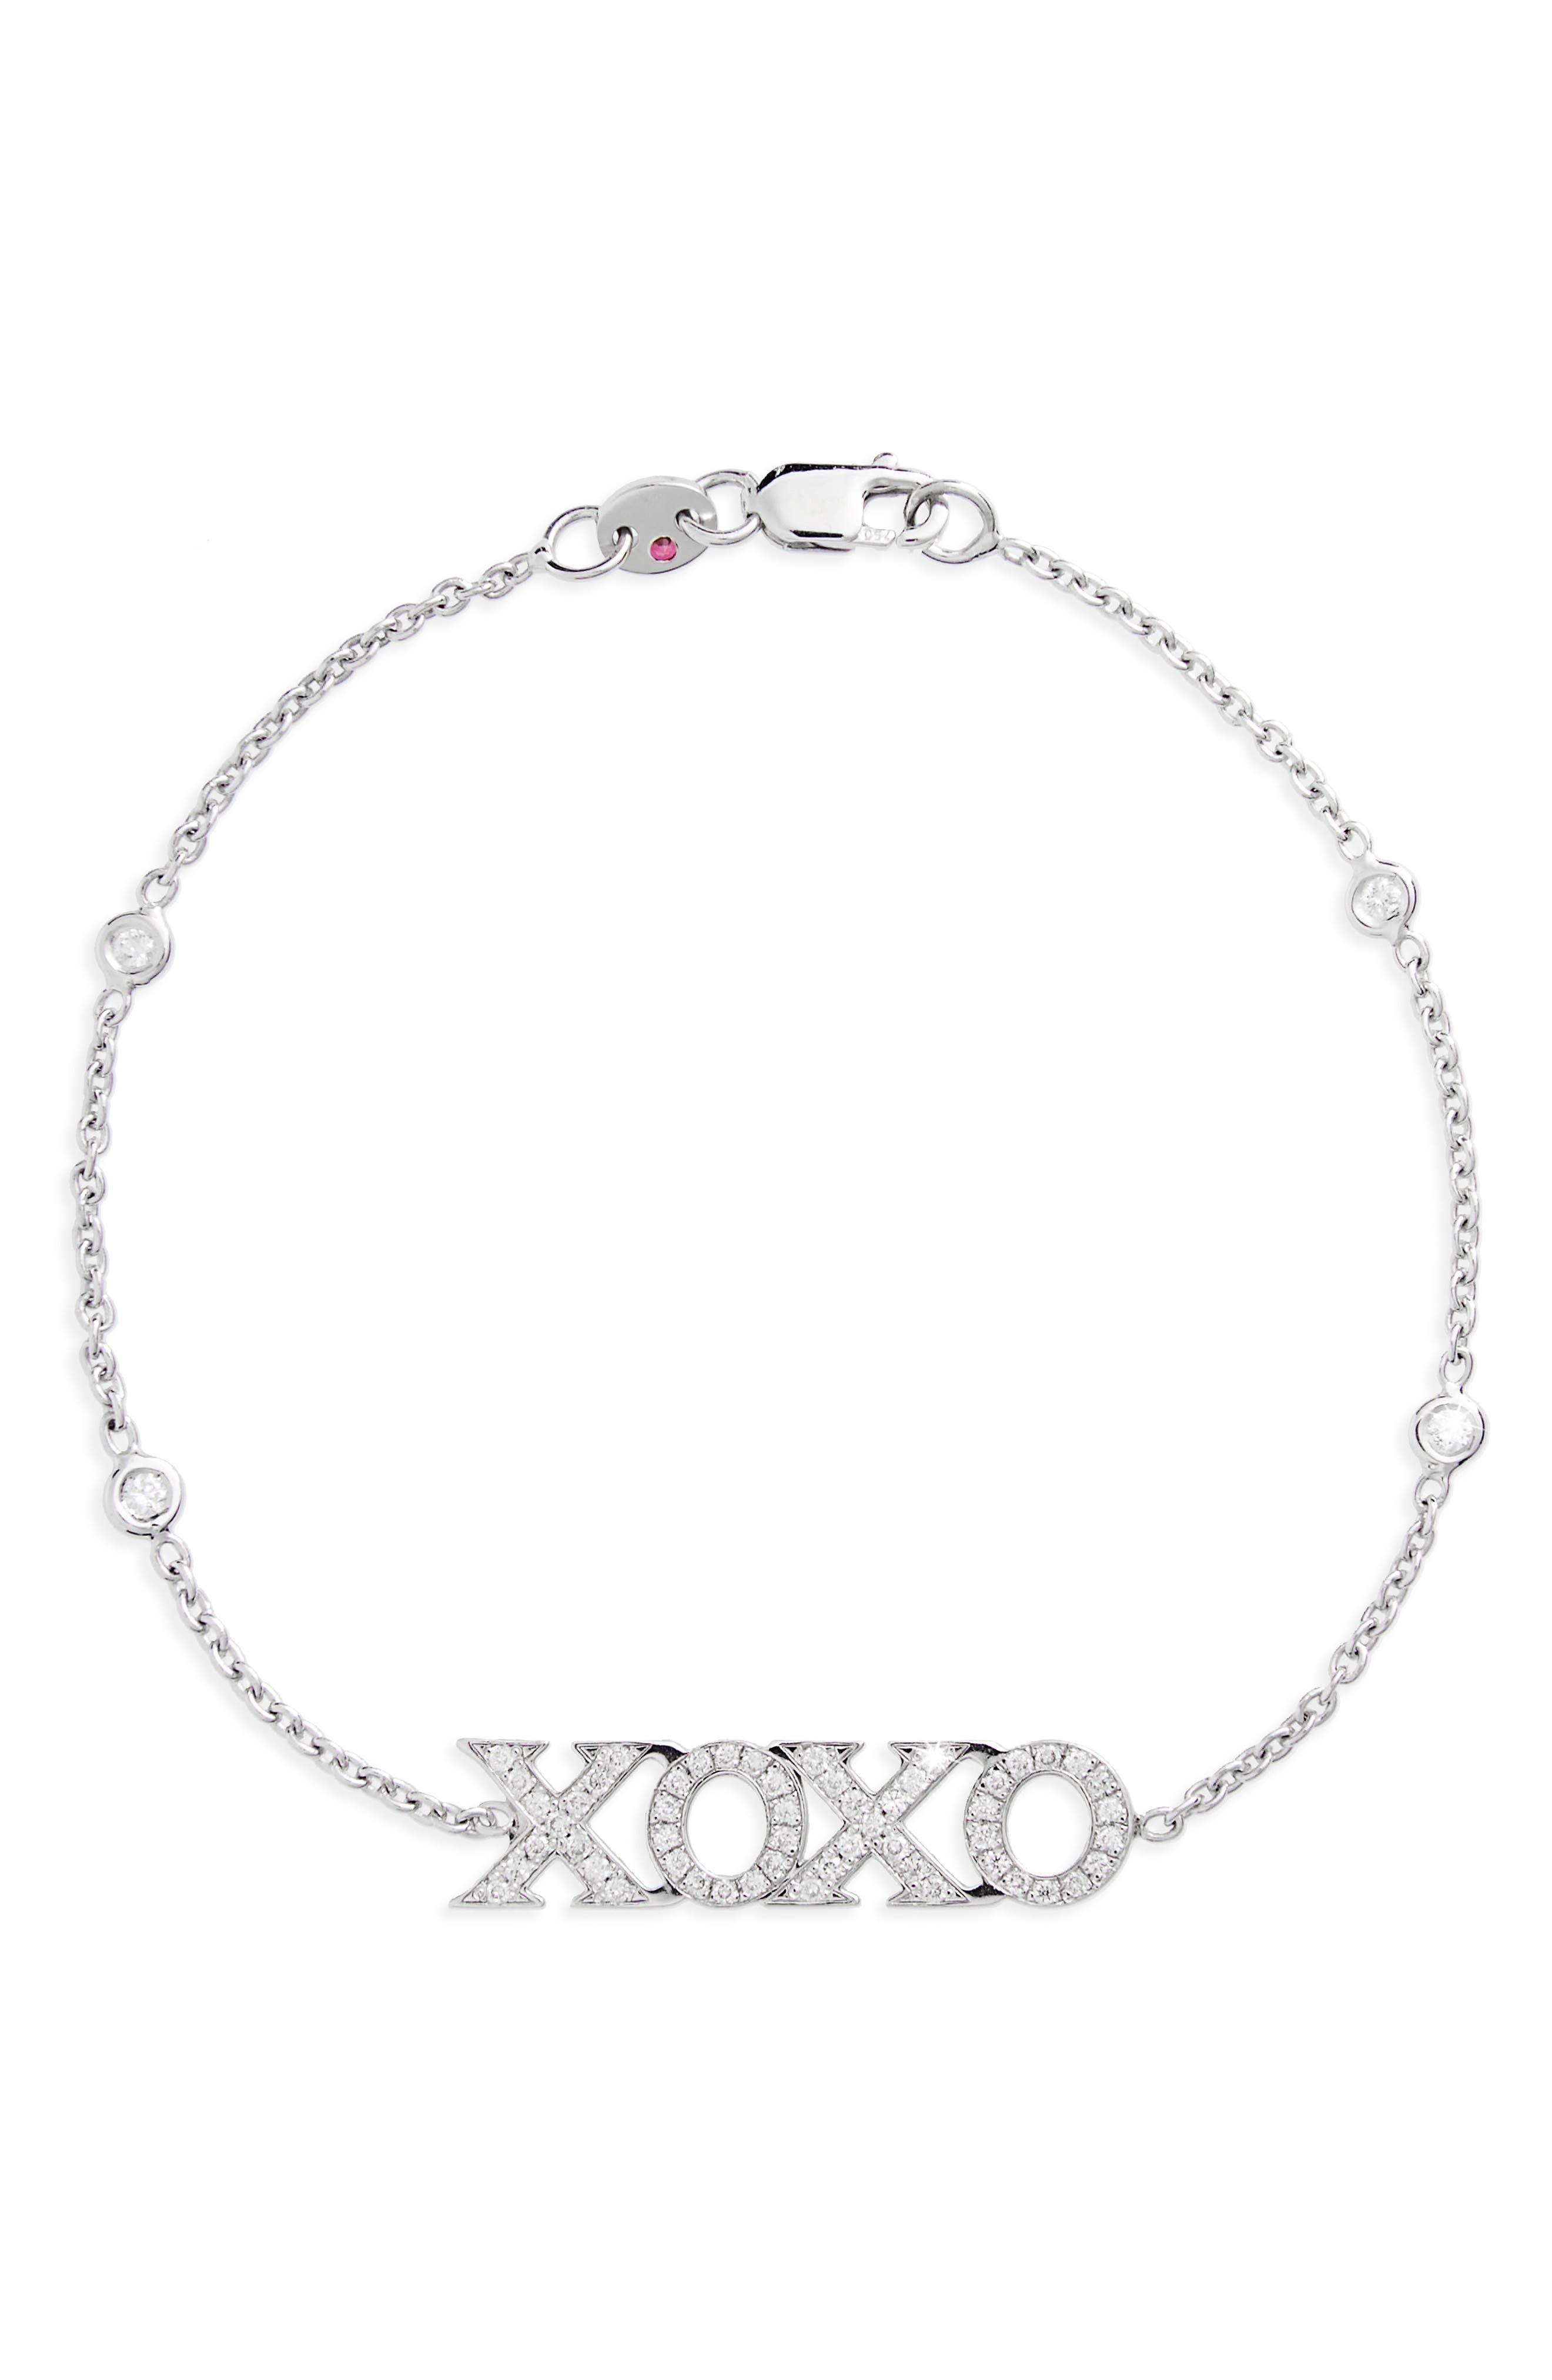 XOXO Diamond Bracelet,                             Main thumbnail 1, color,                             WHITE GOLD